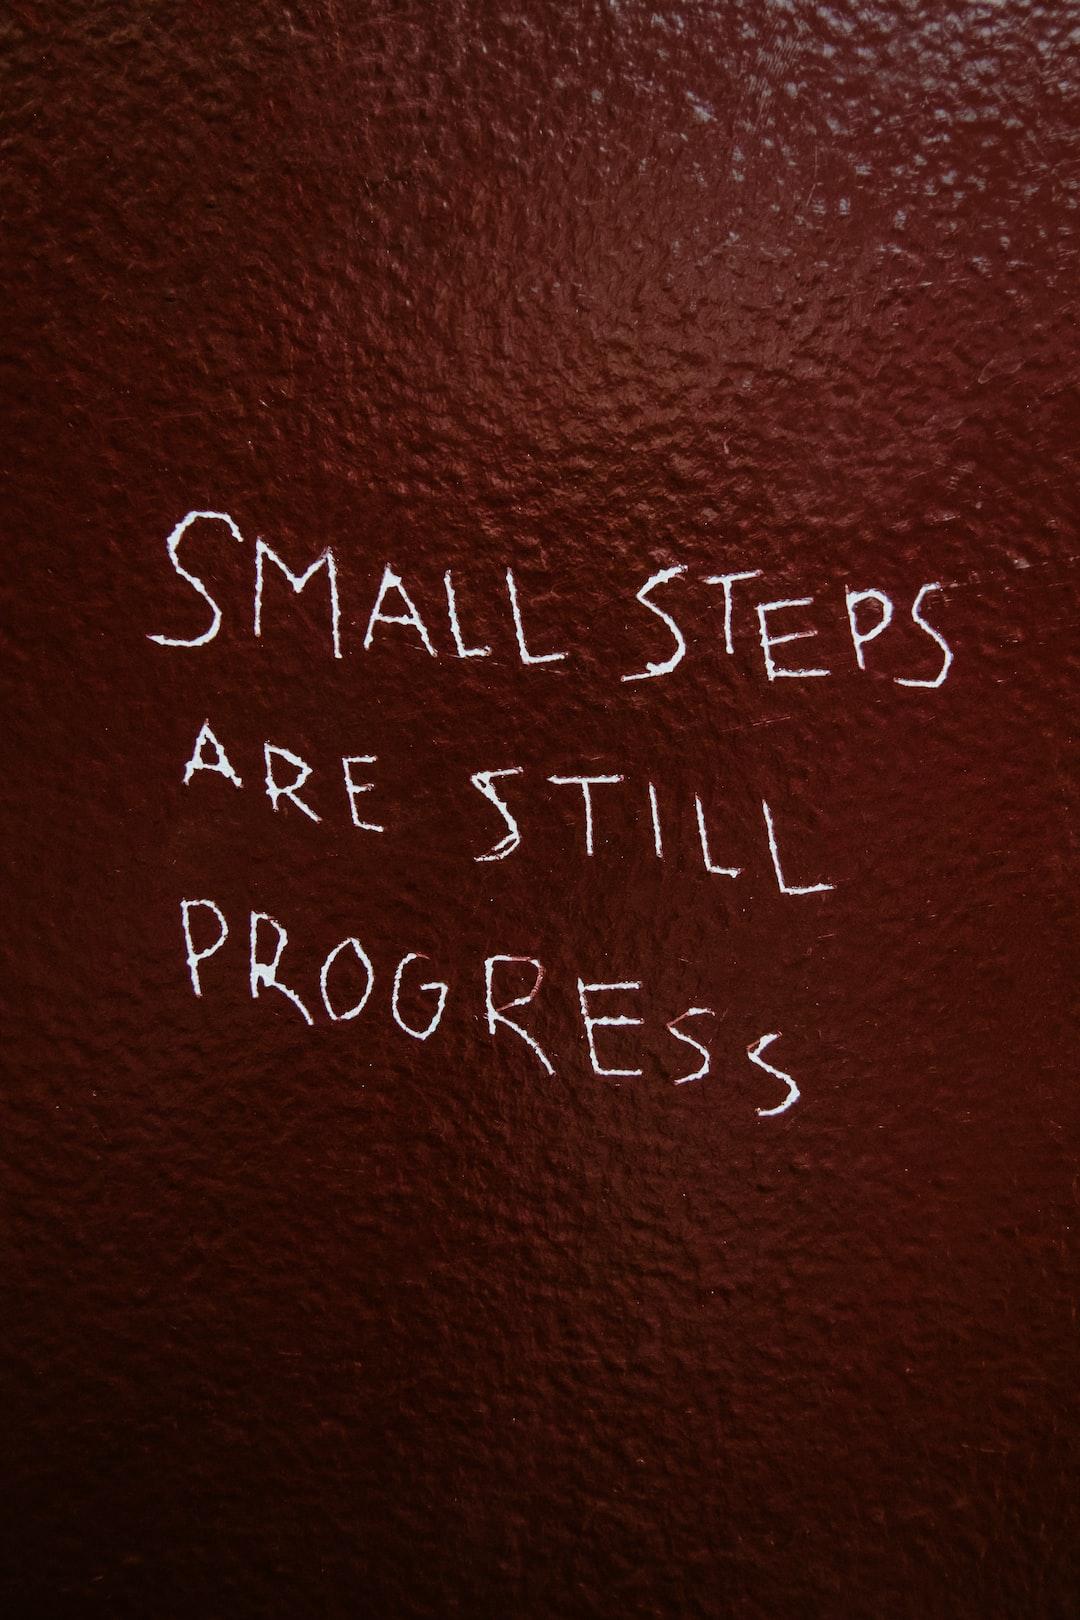 on forward progress